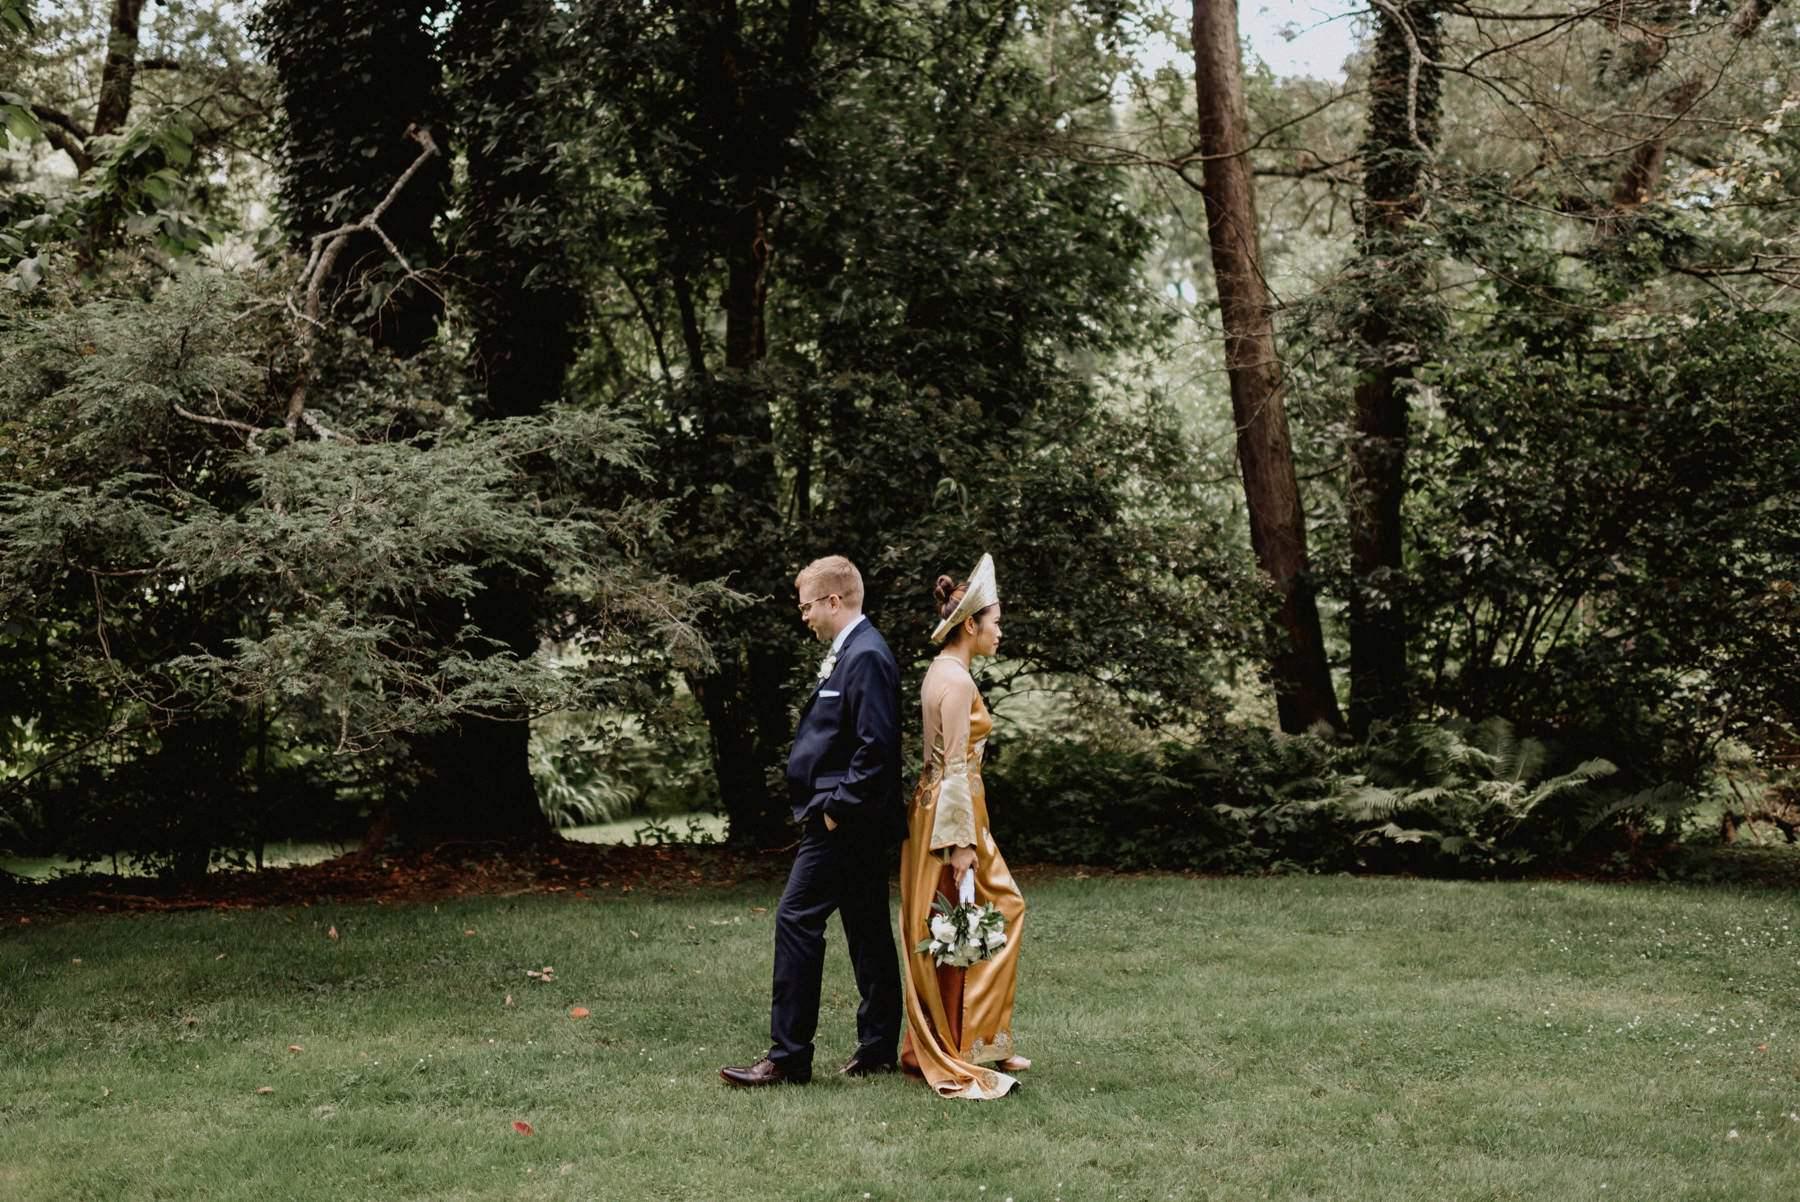 Appleford-estate-wedding-35.jpg